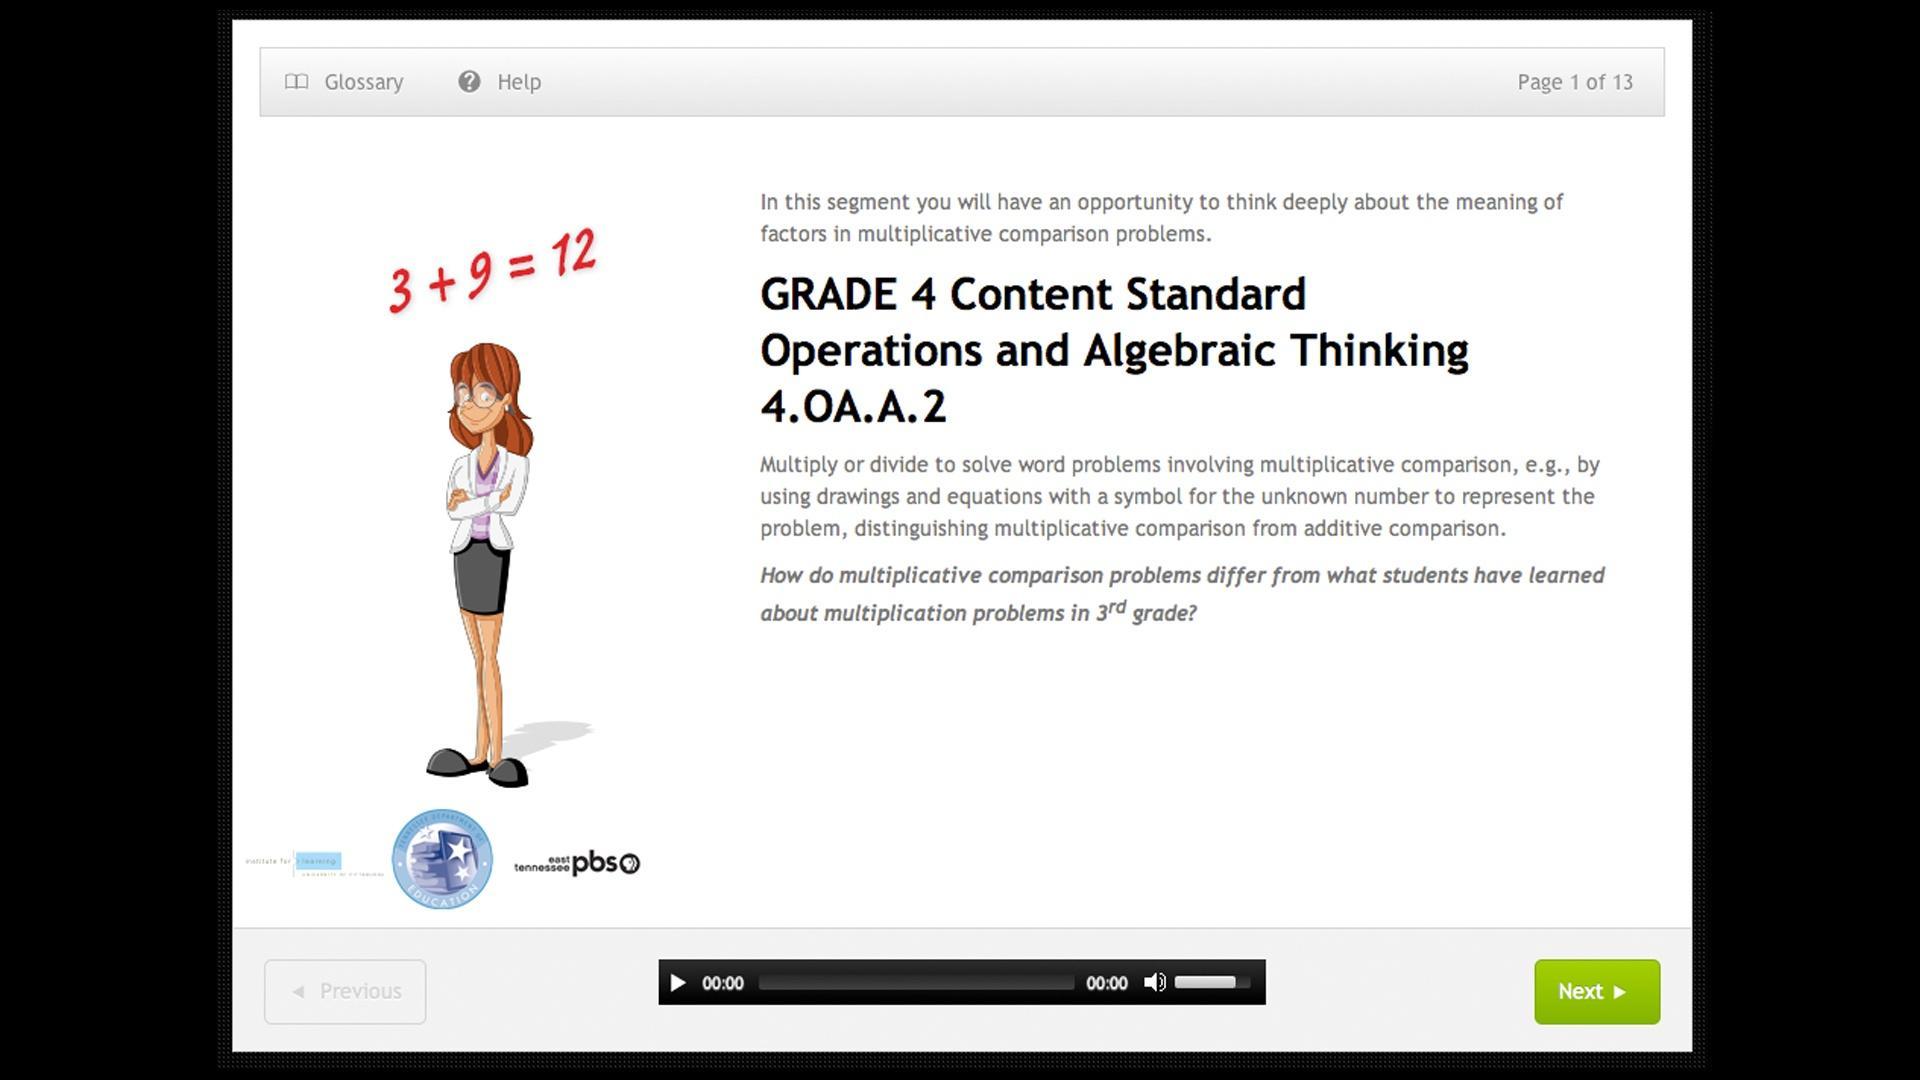 Operations And Algebraic Thinking Grade 4 4 Oa A 2